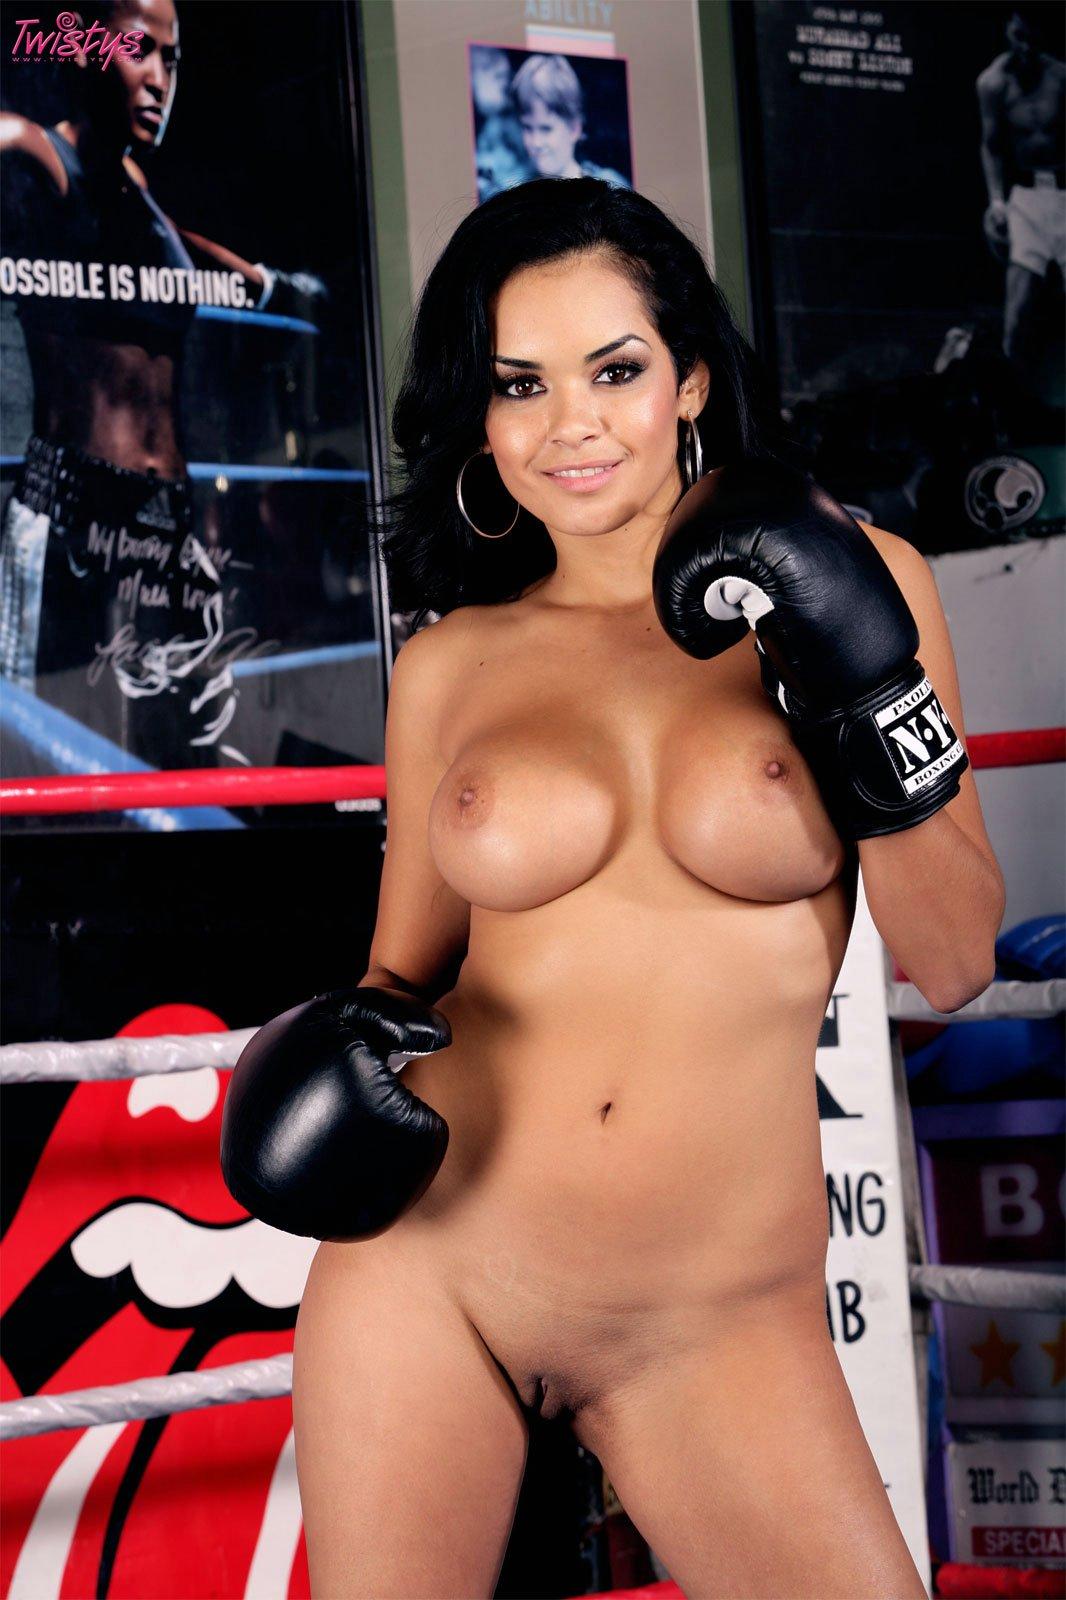 Boxing porn